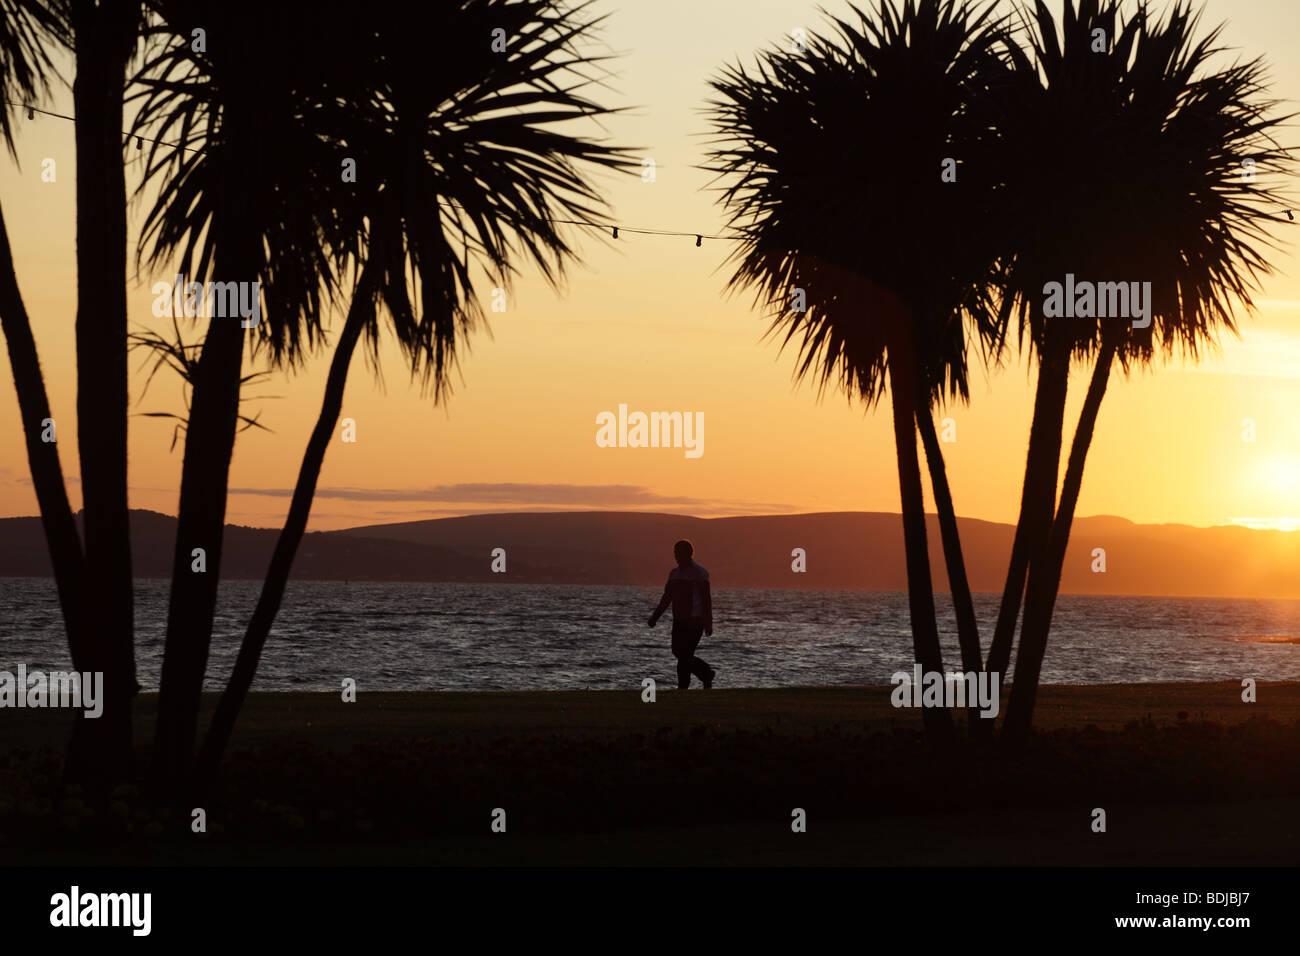 Person walking between palm trees at sunset, Scotland, UK - Stock Image